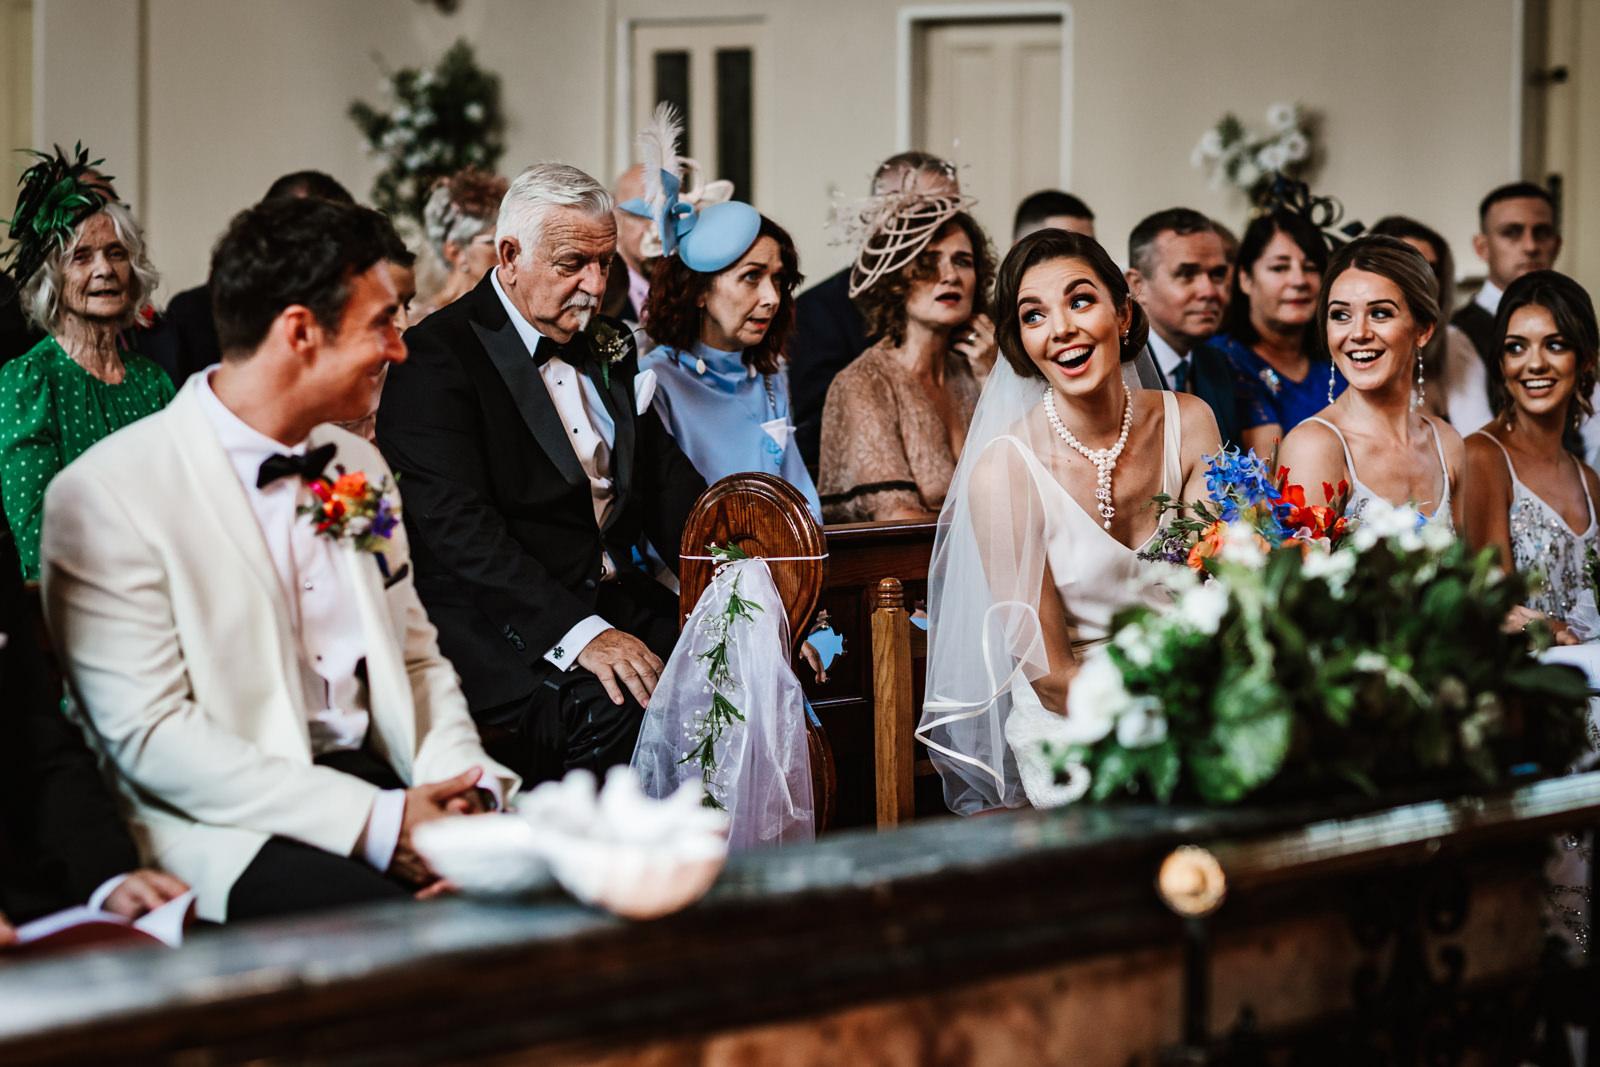 Chshire wedding photographers